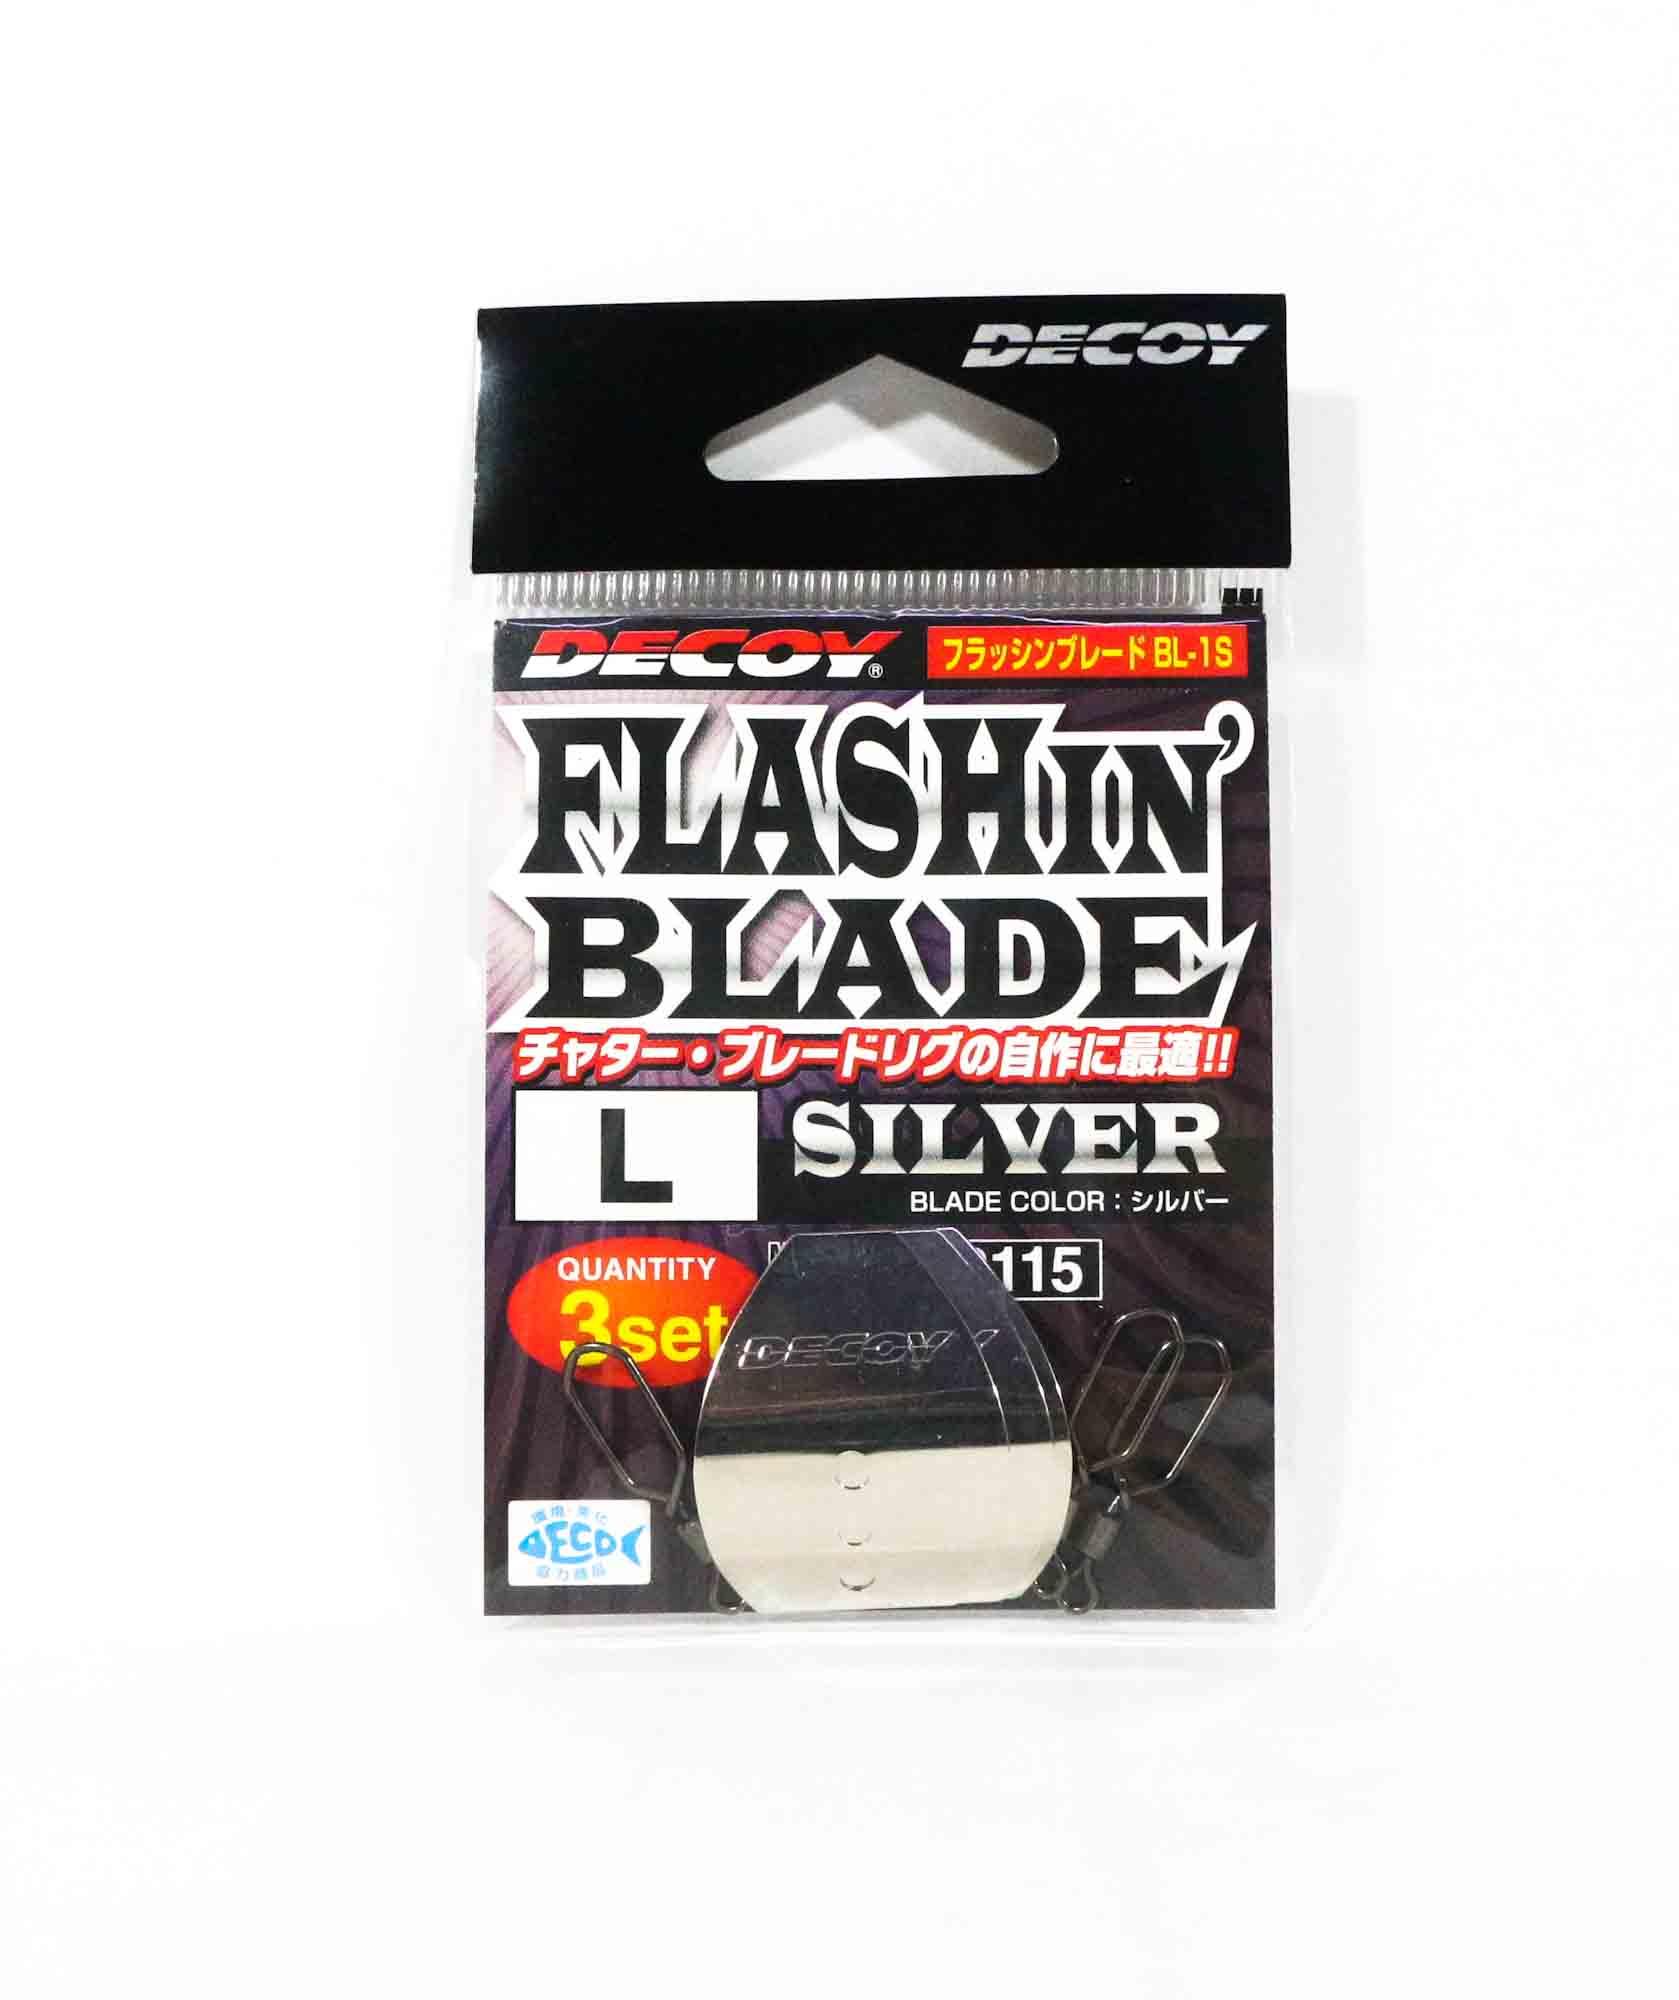 Decoy BL-1S Flashin Blade Silver Size L (2115)